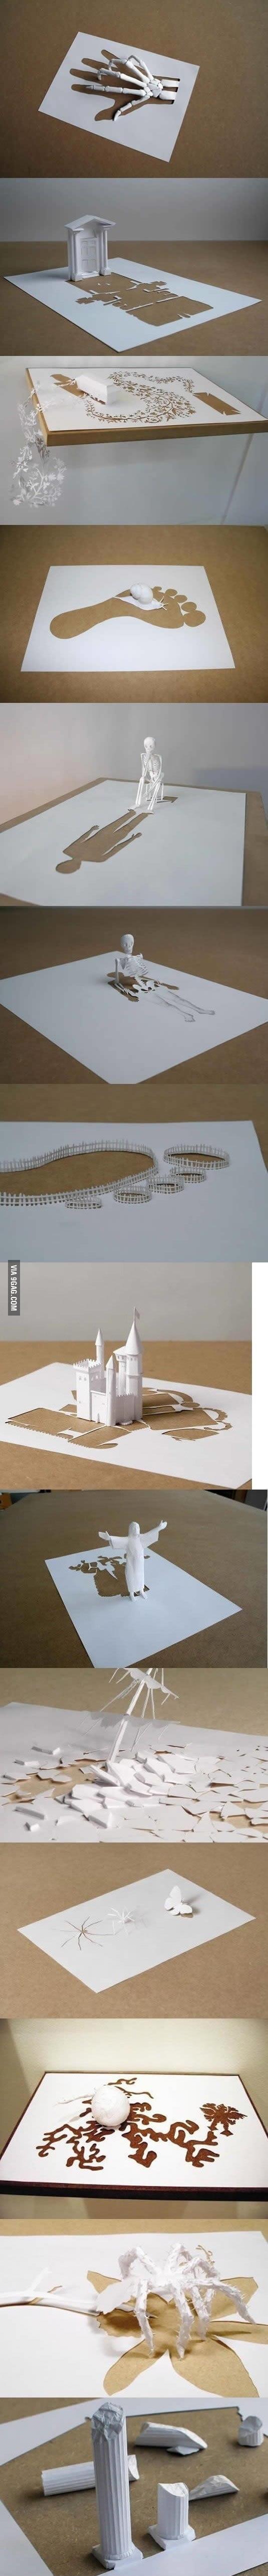 Amazing paper art!